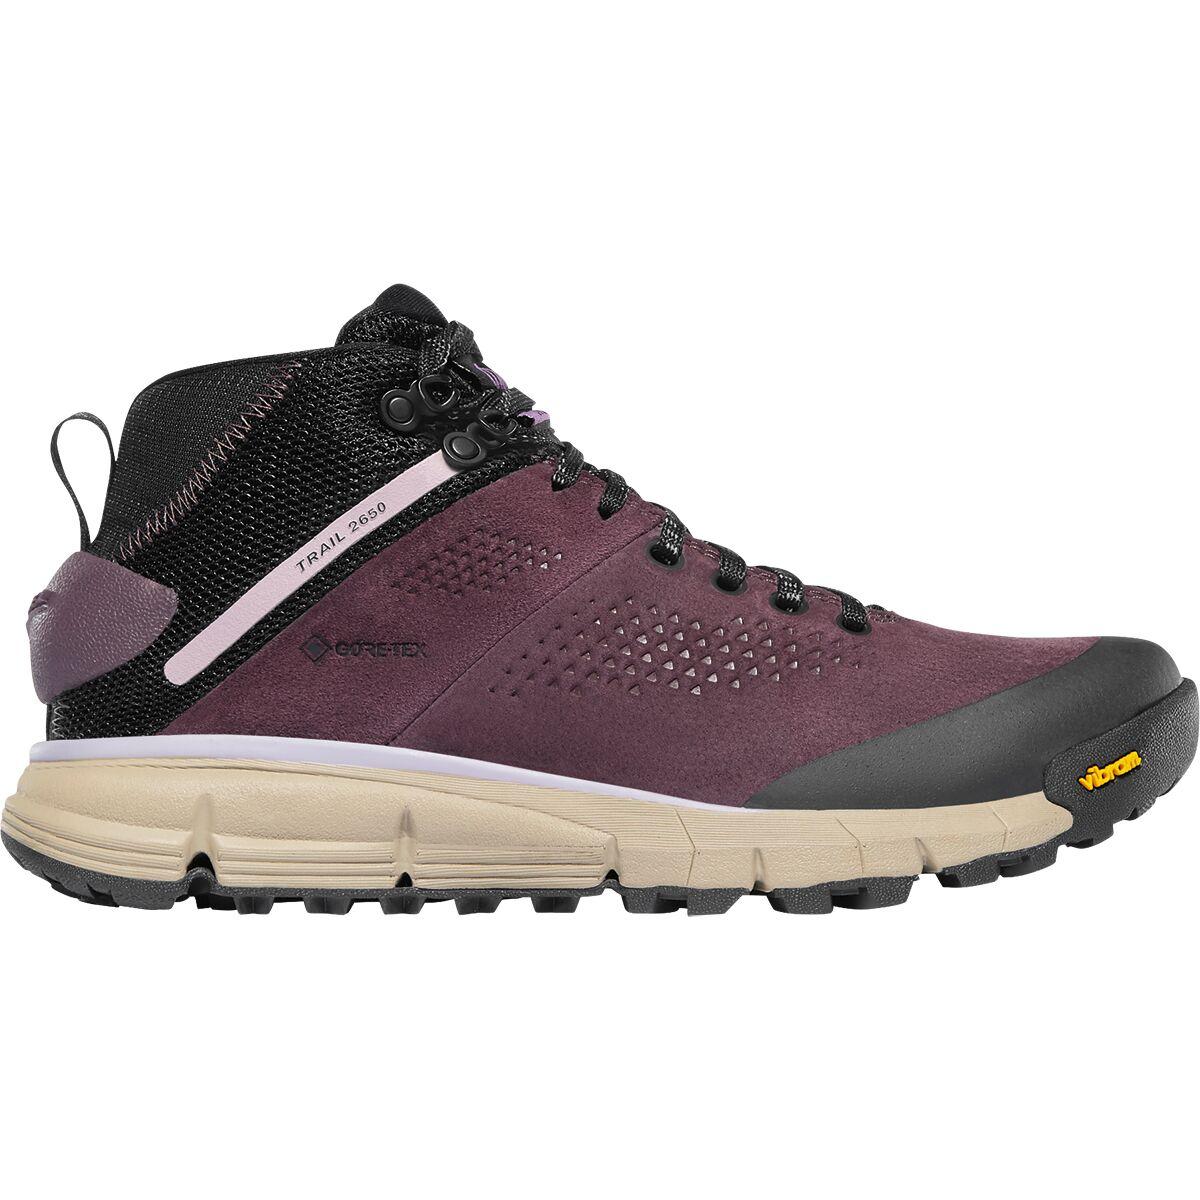 Danner Trail 2650 GTX Mid Hiking Boot